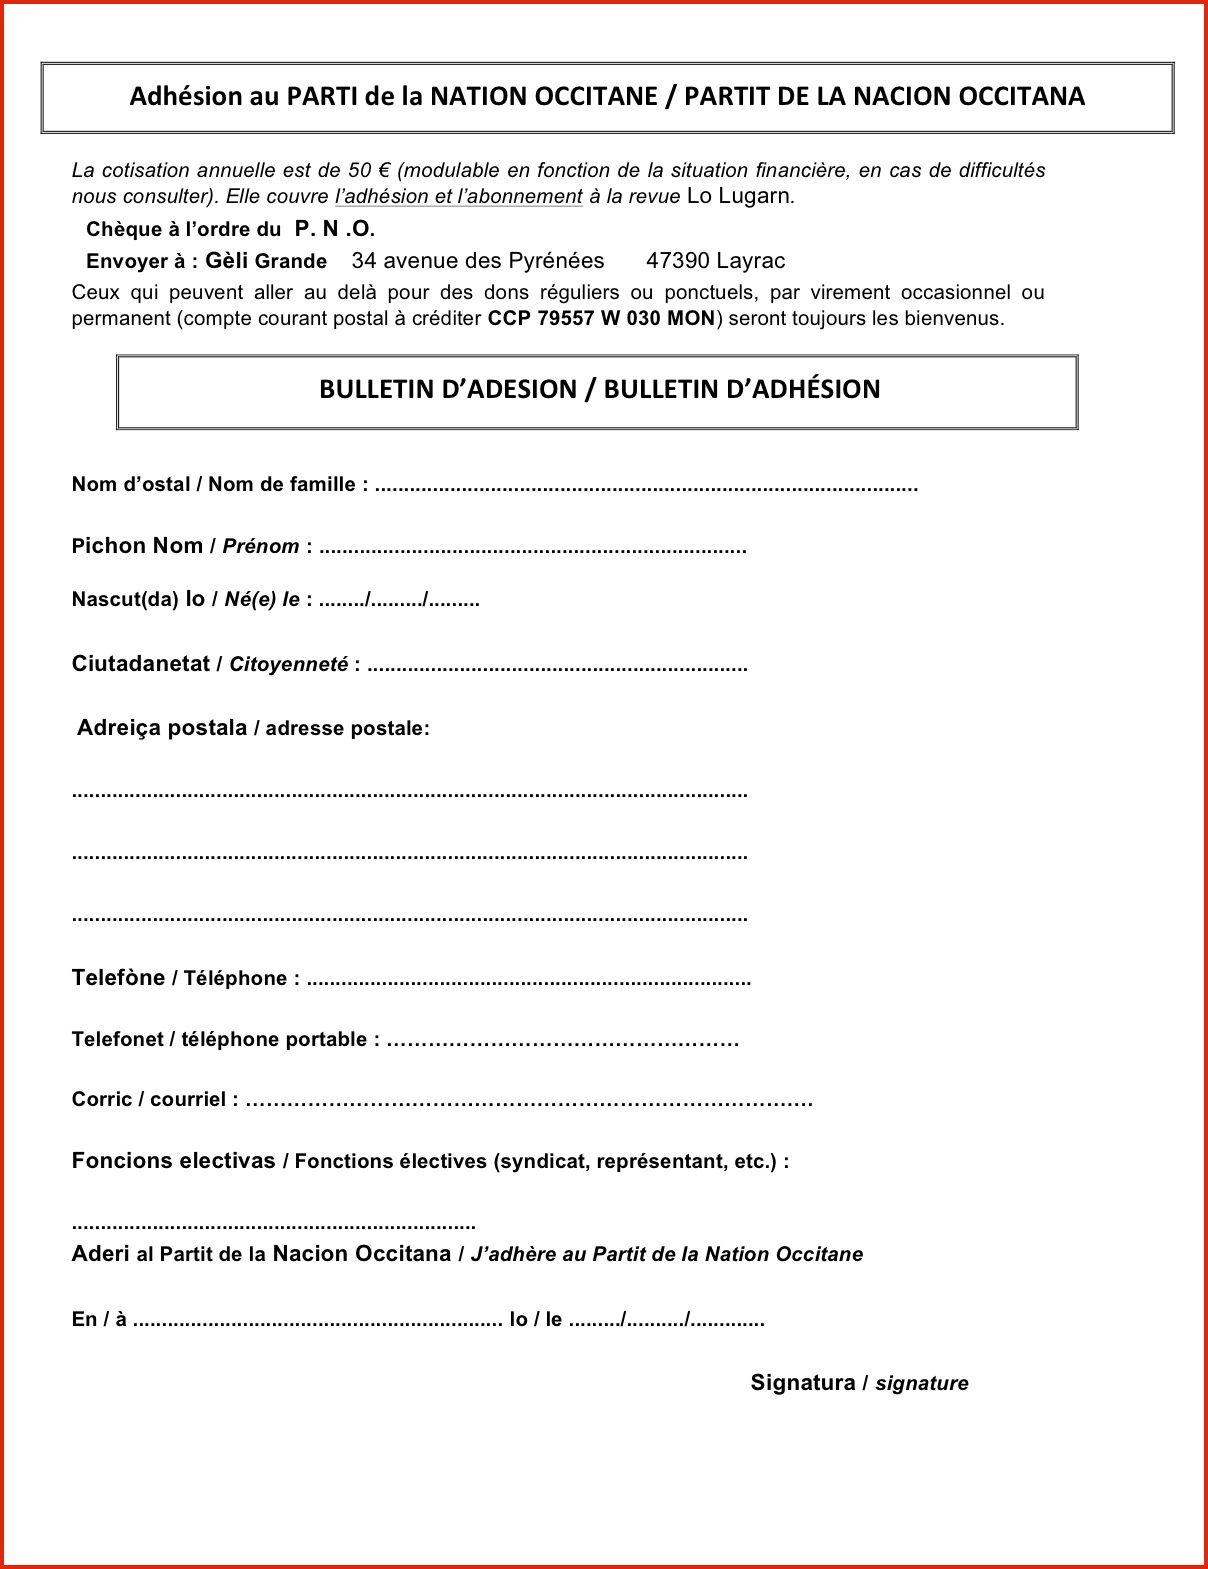 BULLETIN D'ADESION / BULLETIN D'ADHÉSION P.N.O